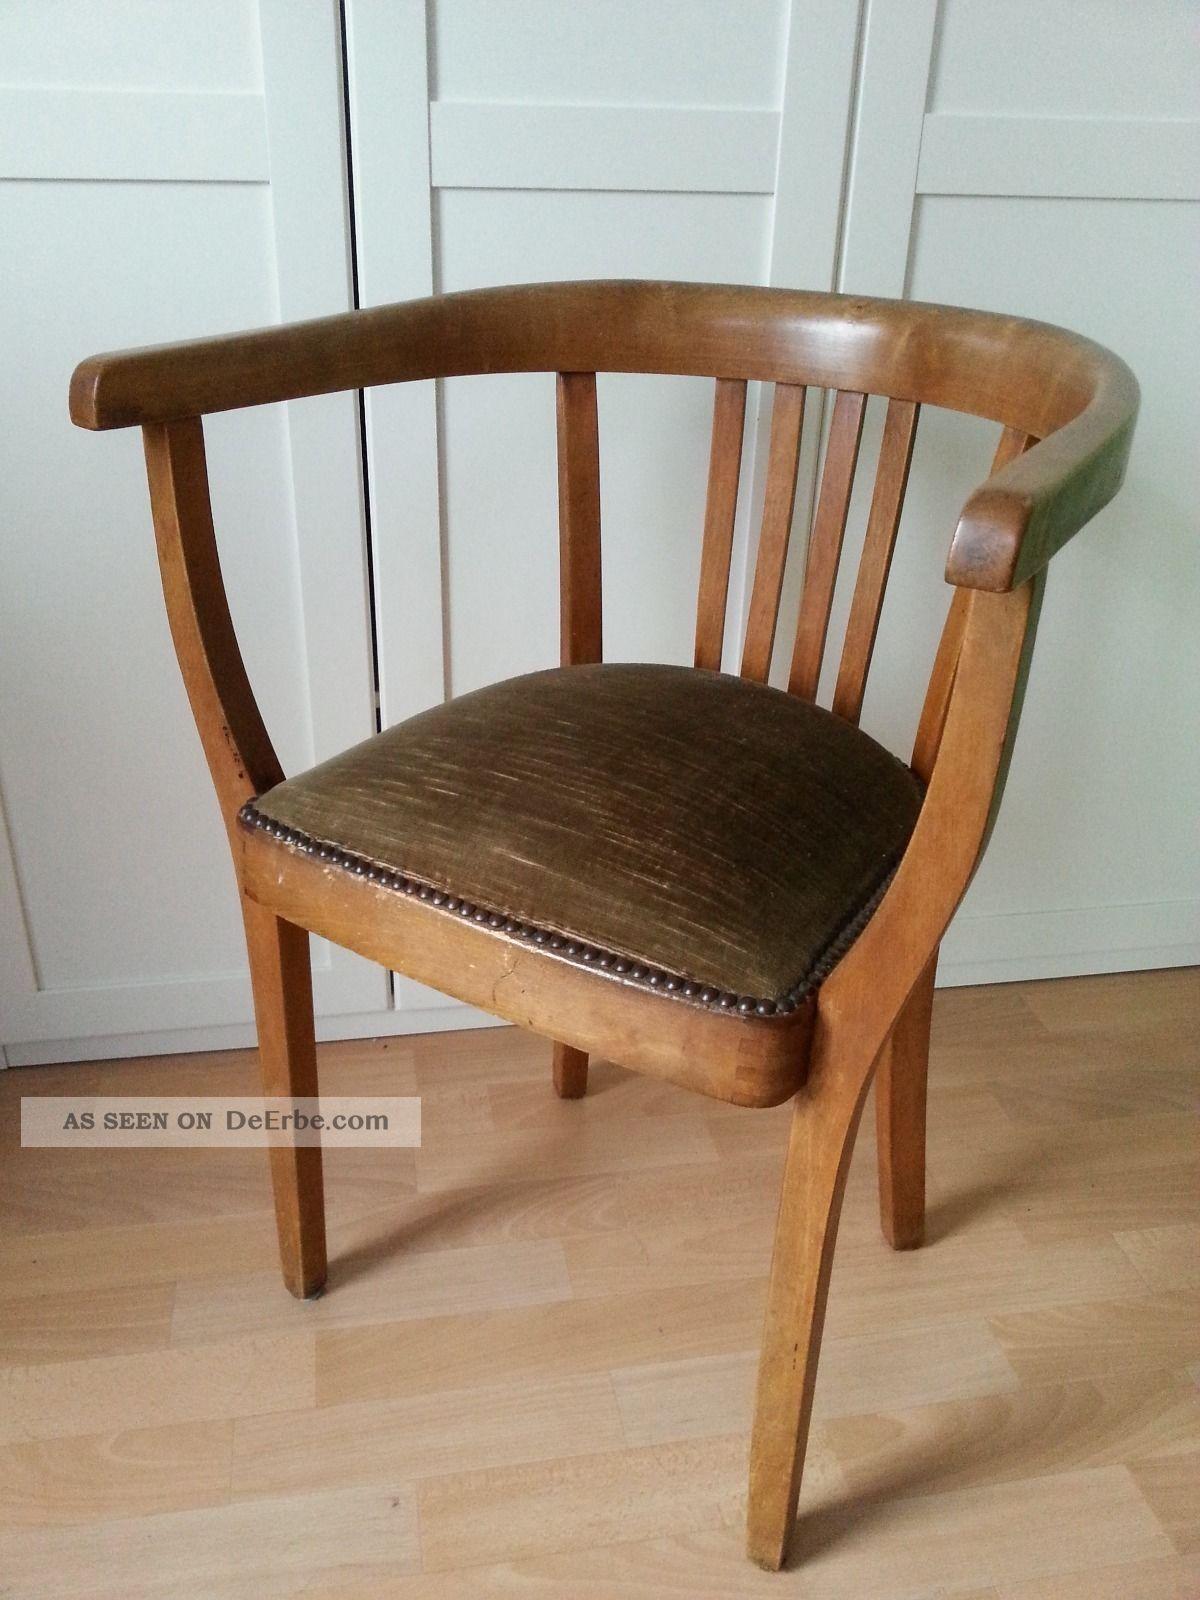 alter schreibtischstuhl bauhaus art deco federkerngepolsterter armlehnstuhl top. Black Bedroom Furniture Sets. Home Design Ideas